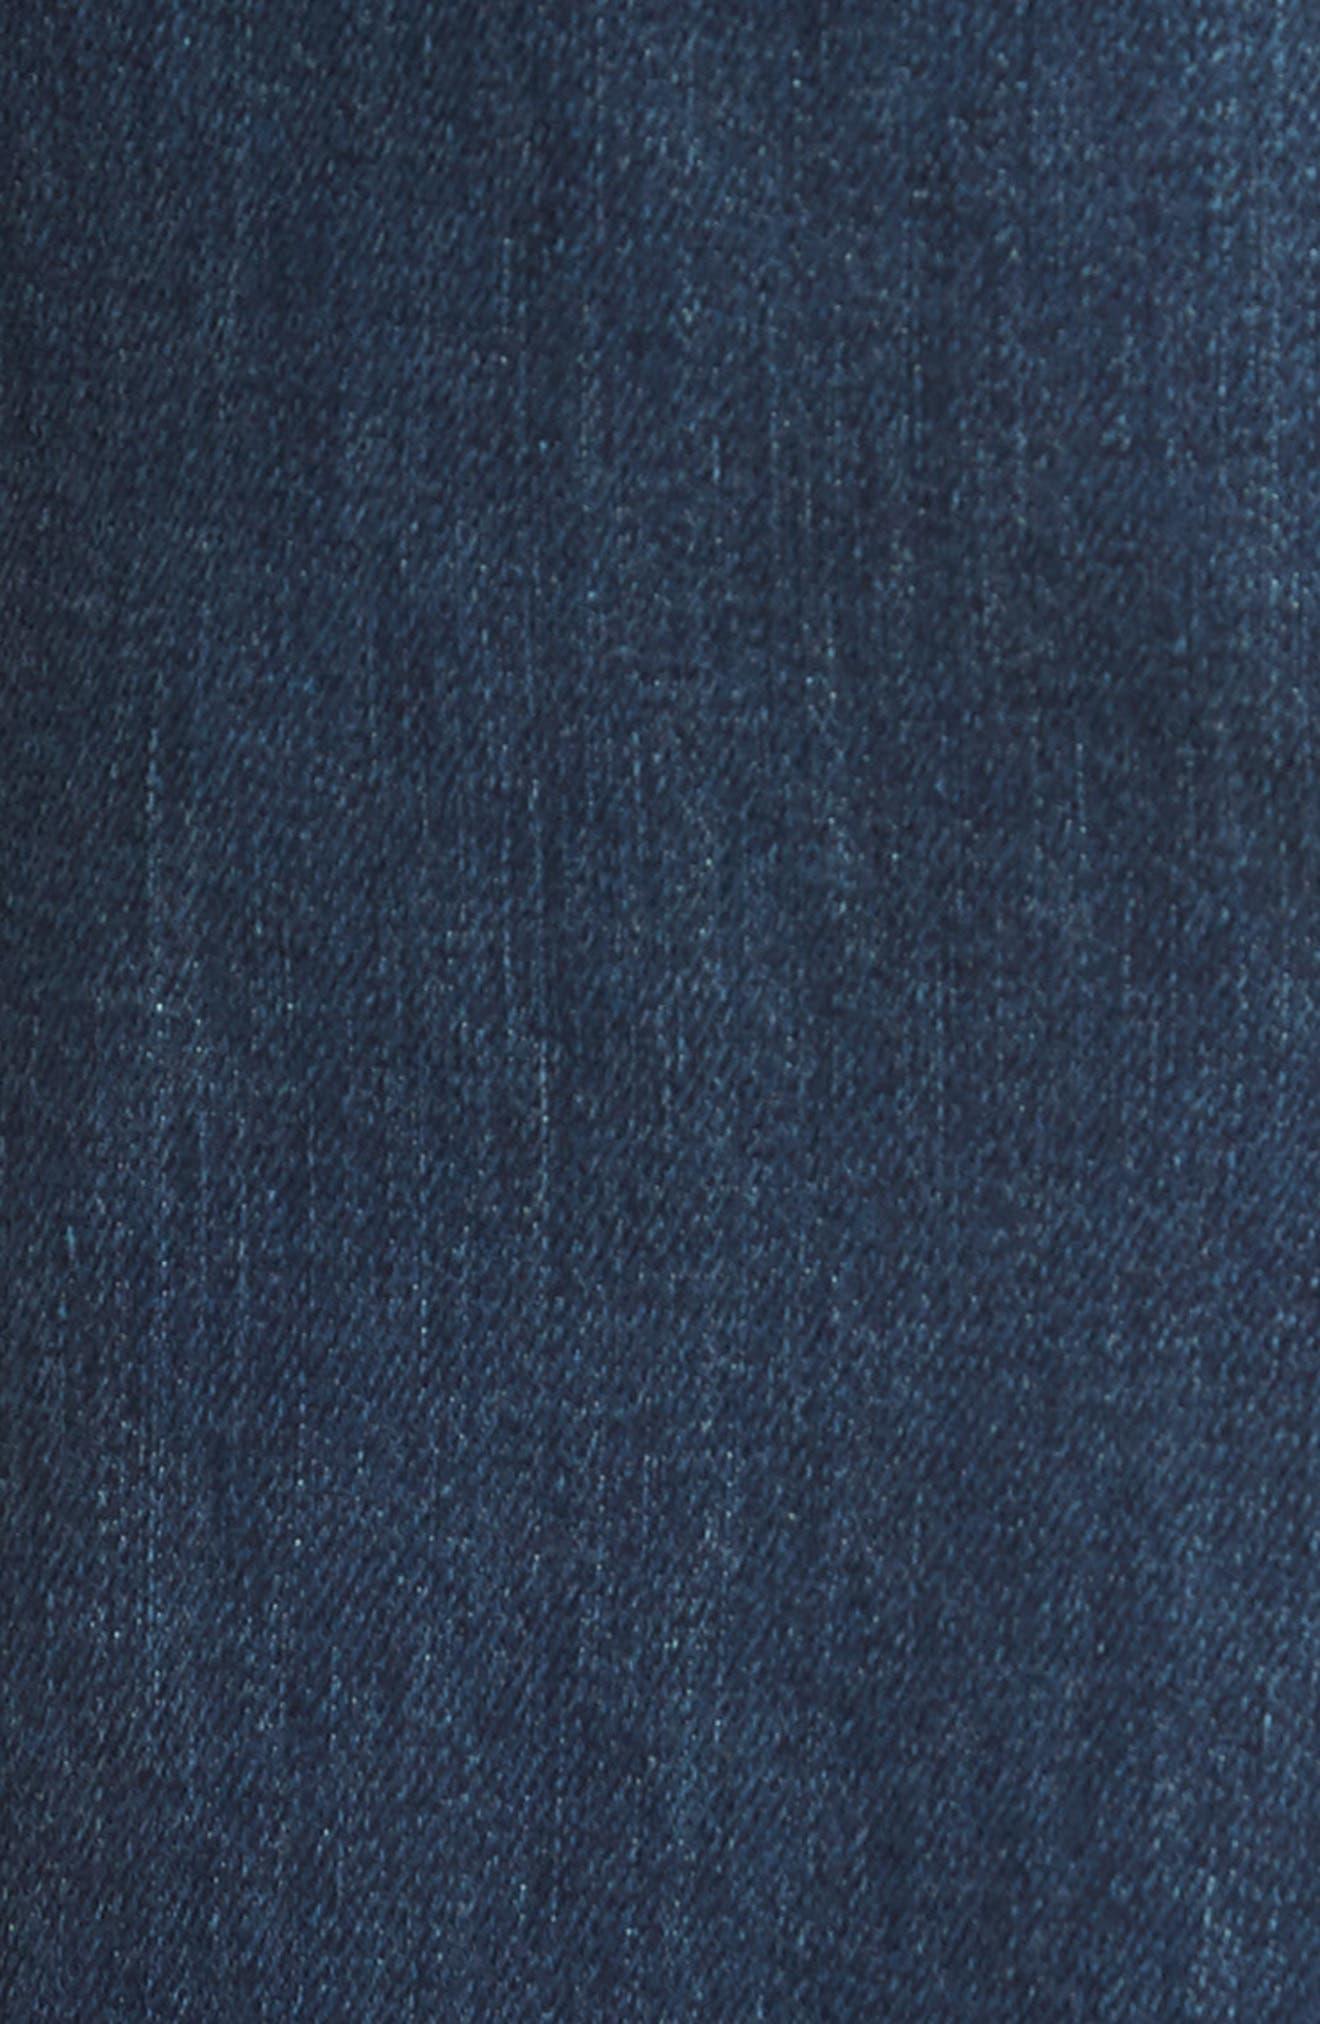 Brixton Slim Straight Fit Jeans,                             Alternate thumbnail 5, color,                             Brady